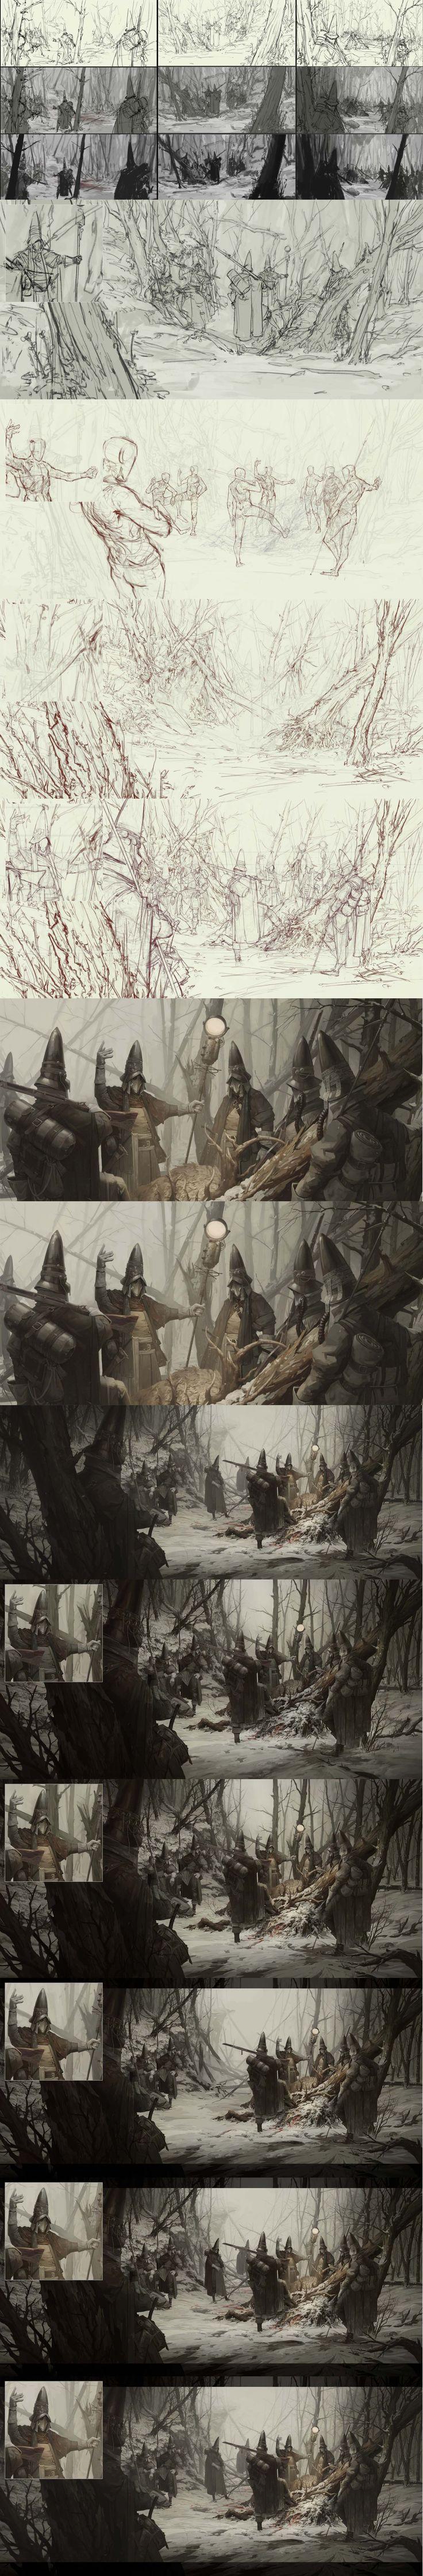 Ash Walkers, First Hunt by TIMOFEY STEPANOV  https://www.artstation.com/artwork/zWwBZ